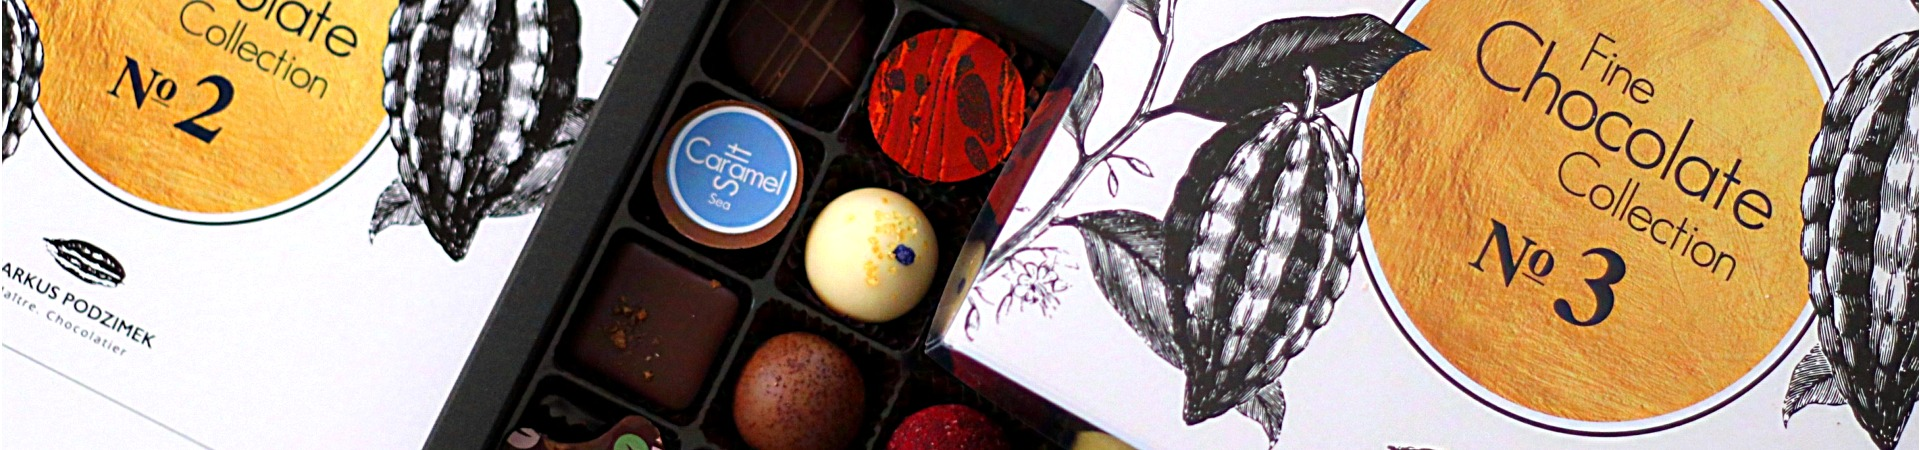 Fine Chocolate 2021